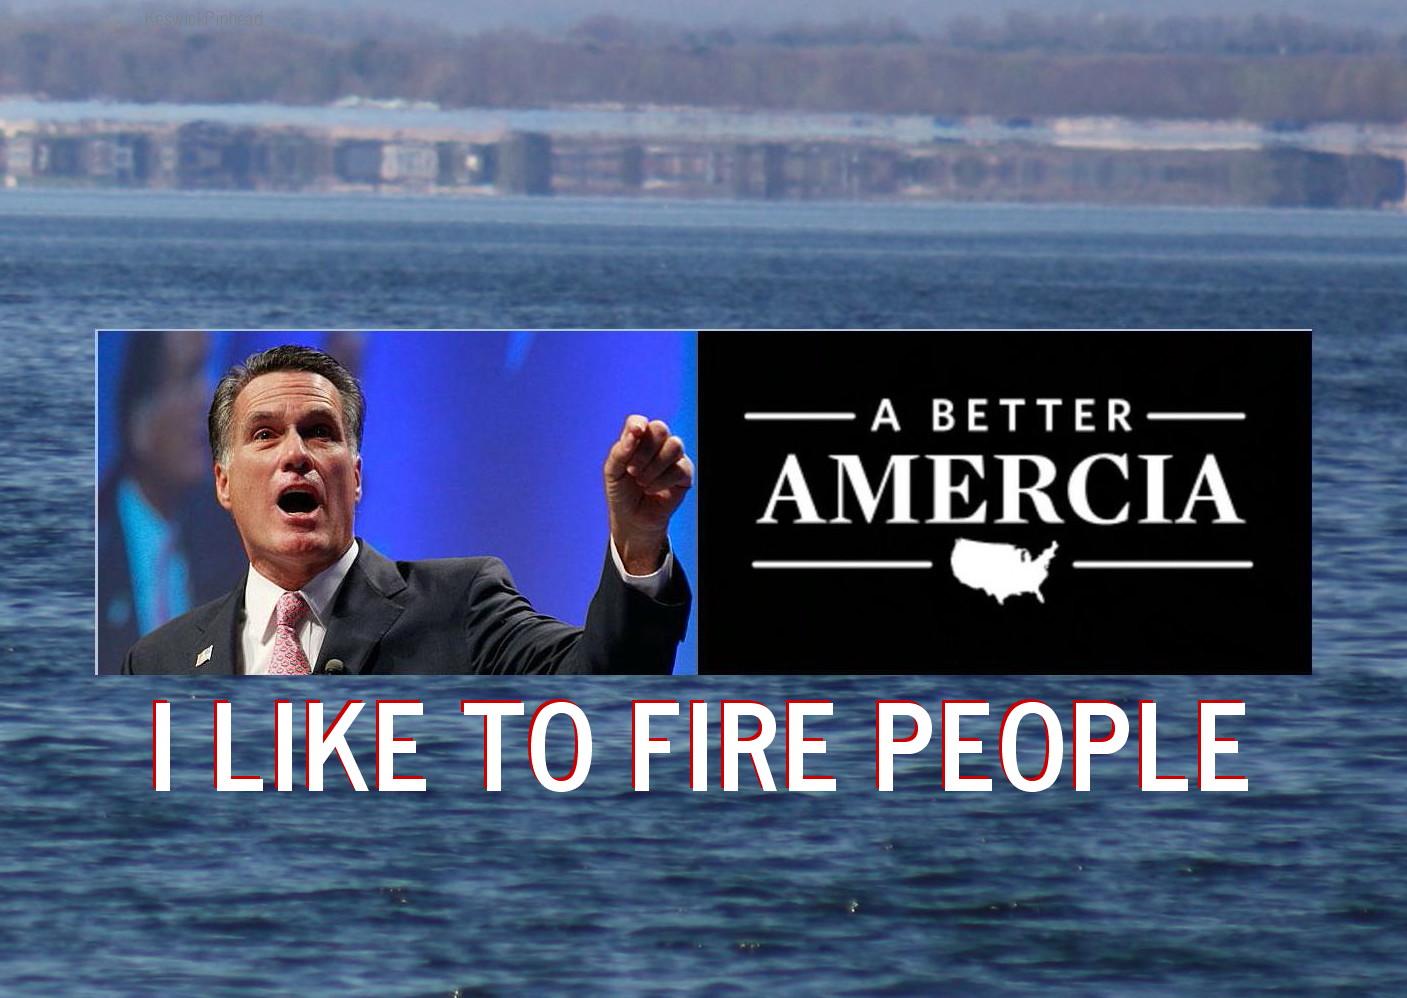 Mitt Romney should be fired by Mitt Romney by KeswickPinhead